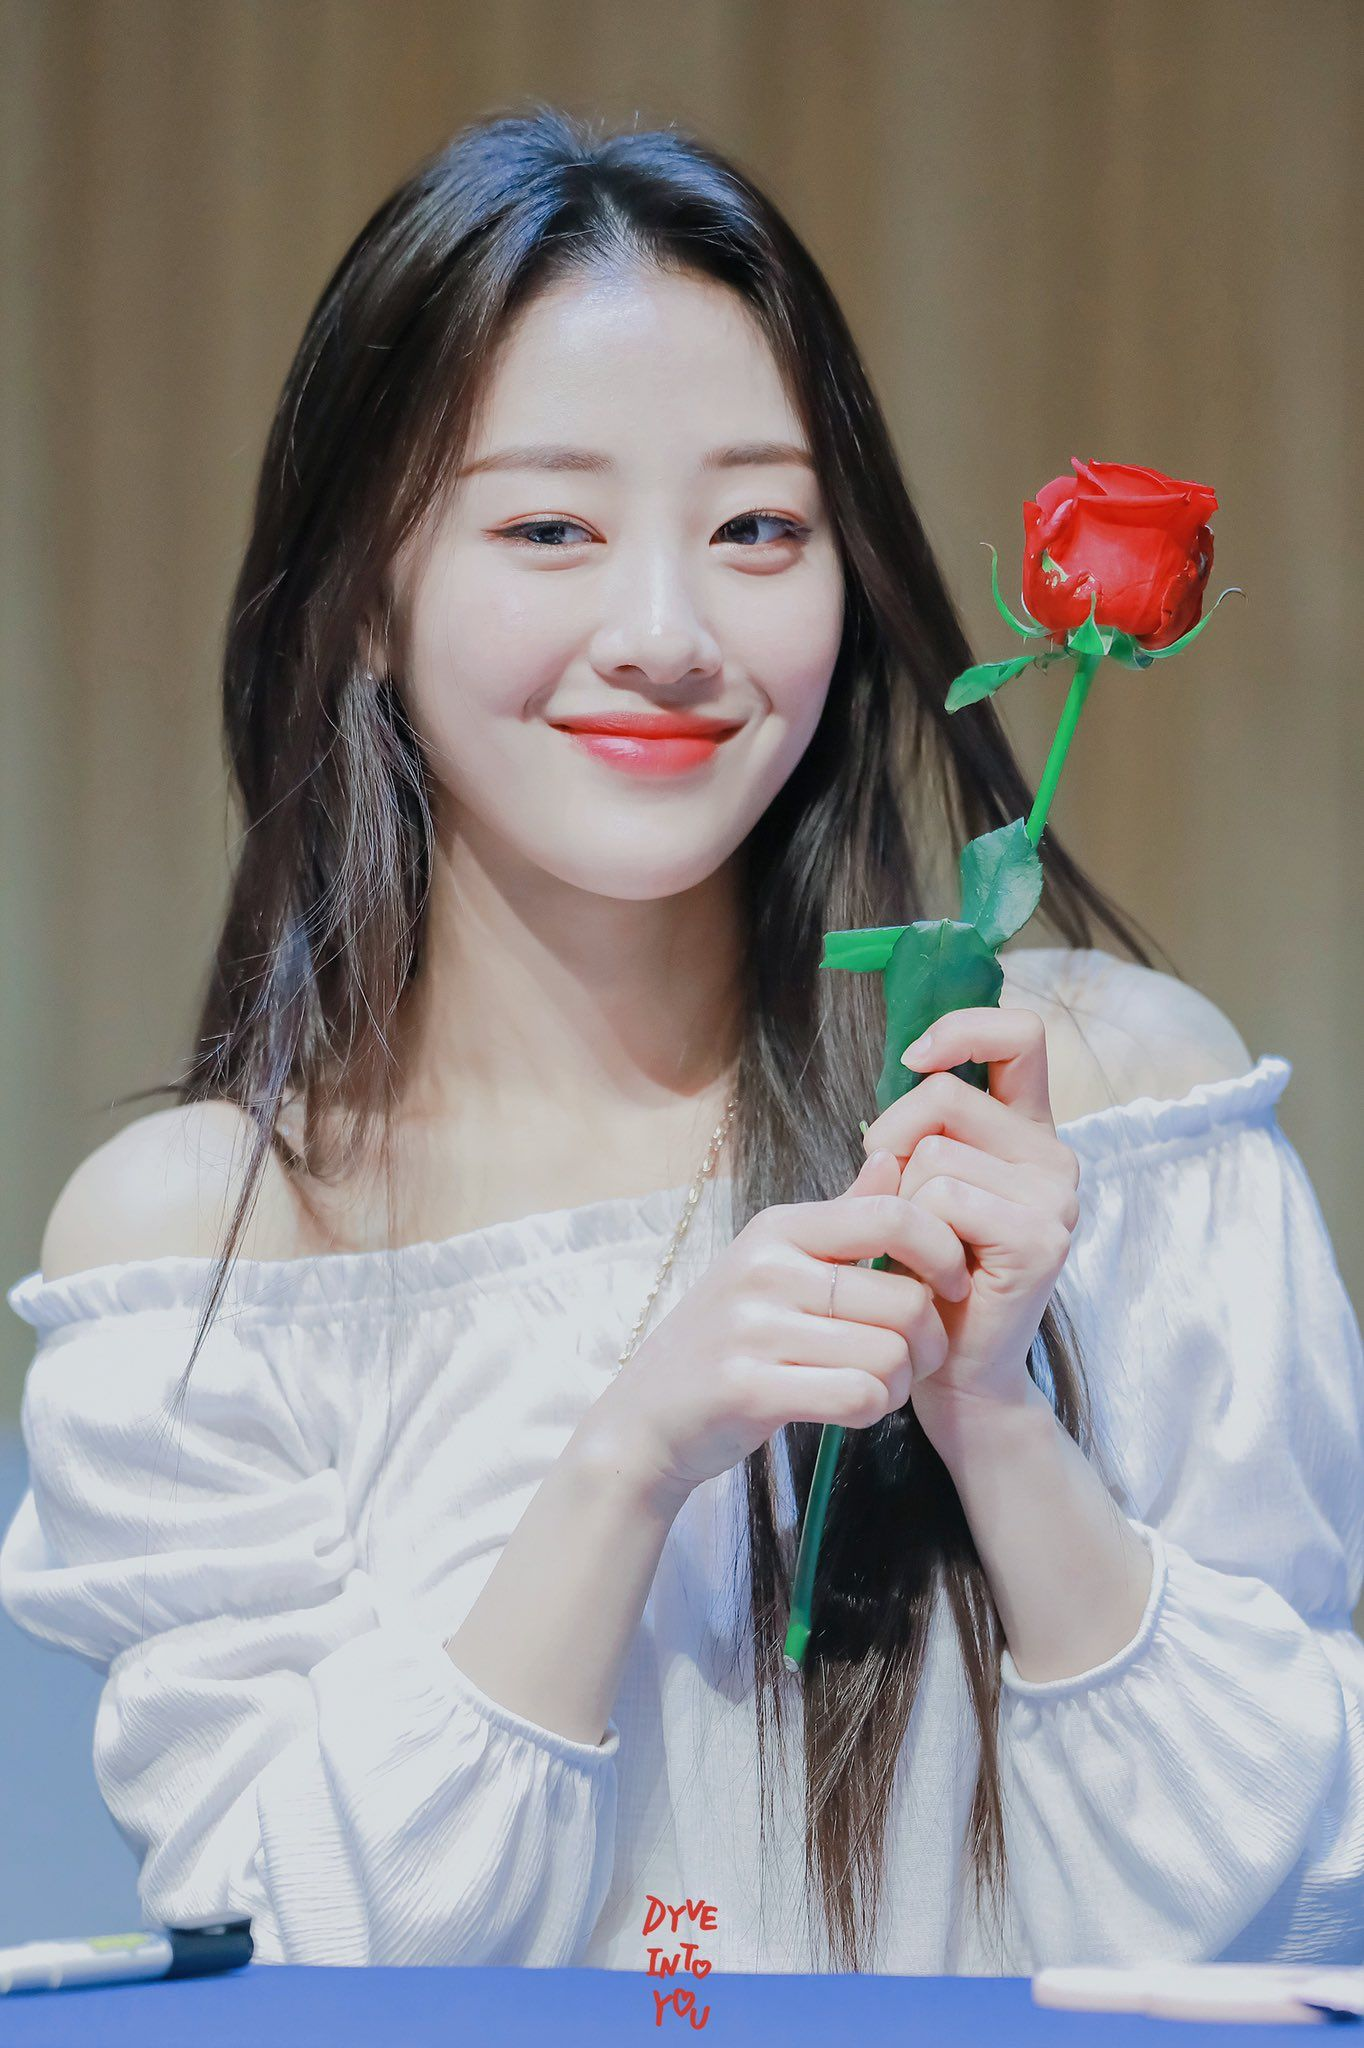 Happy Yves Day Kpop Kdrama Bts Exo Kpoparmy Kpop Girls Kpop Girl Groups Yves Klein